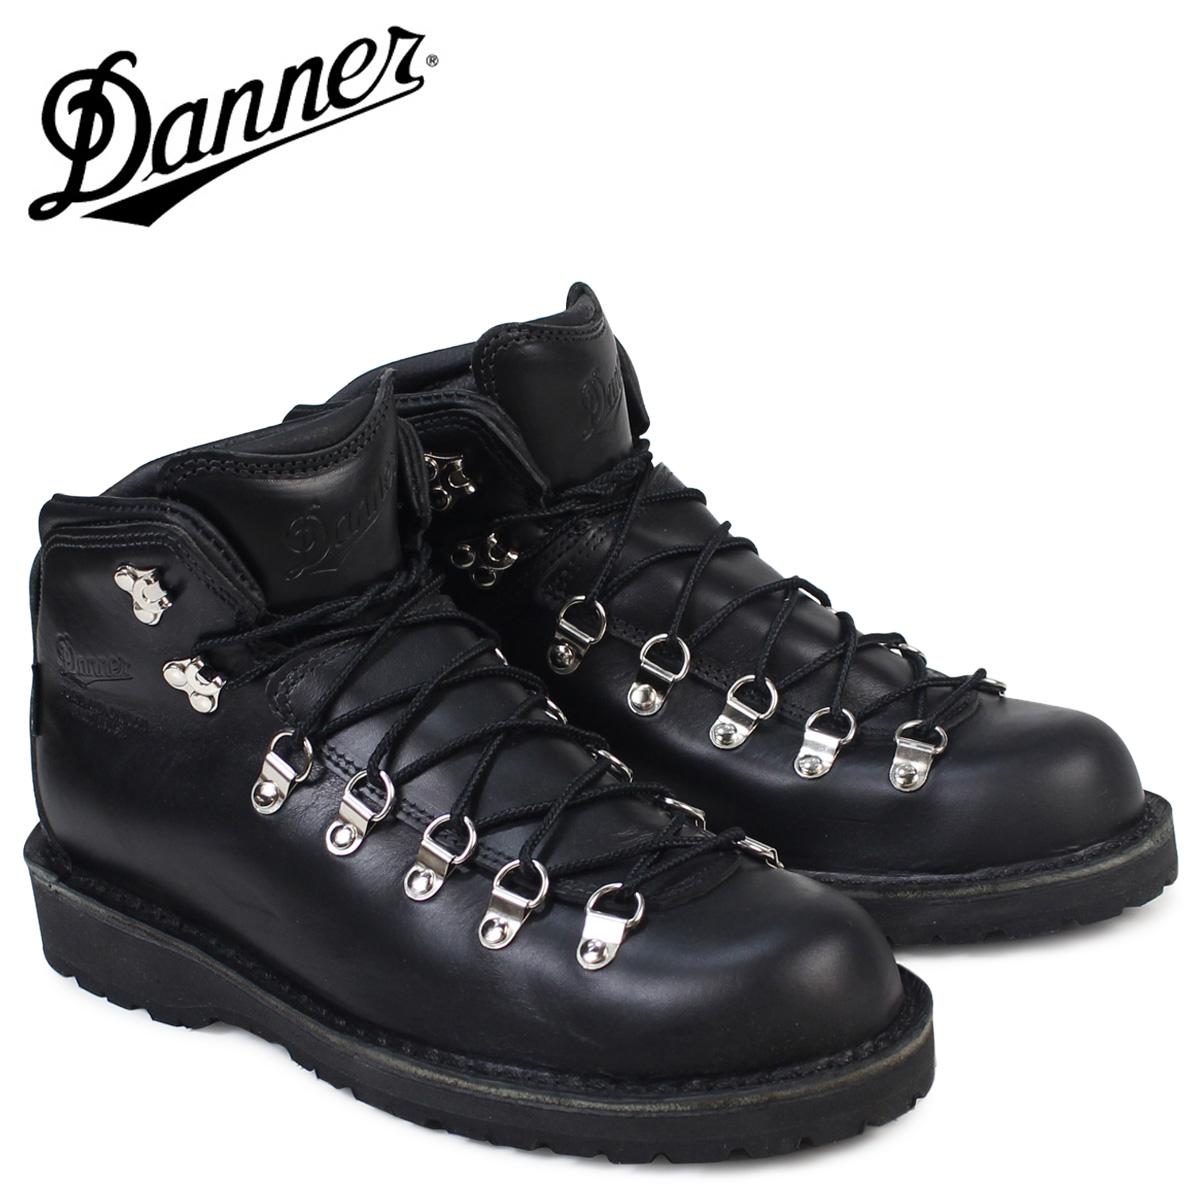 Danner MOUNTAIN PASS ダナー ブーツ 33275 MADE IN USA メンズ ブラック